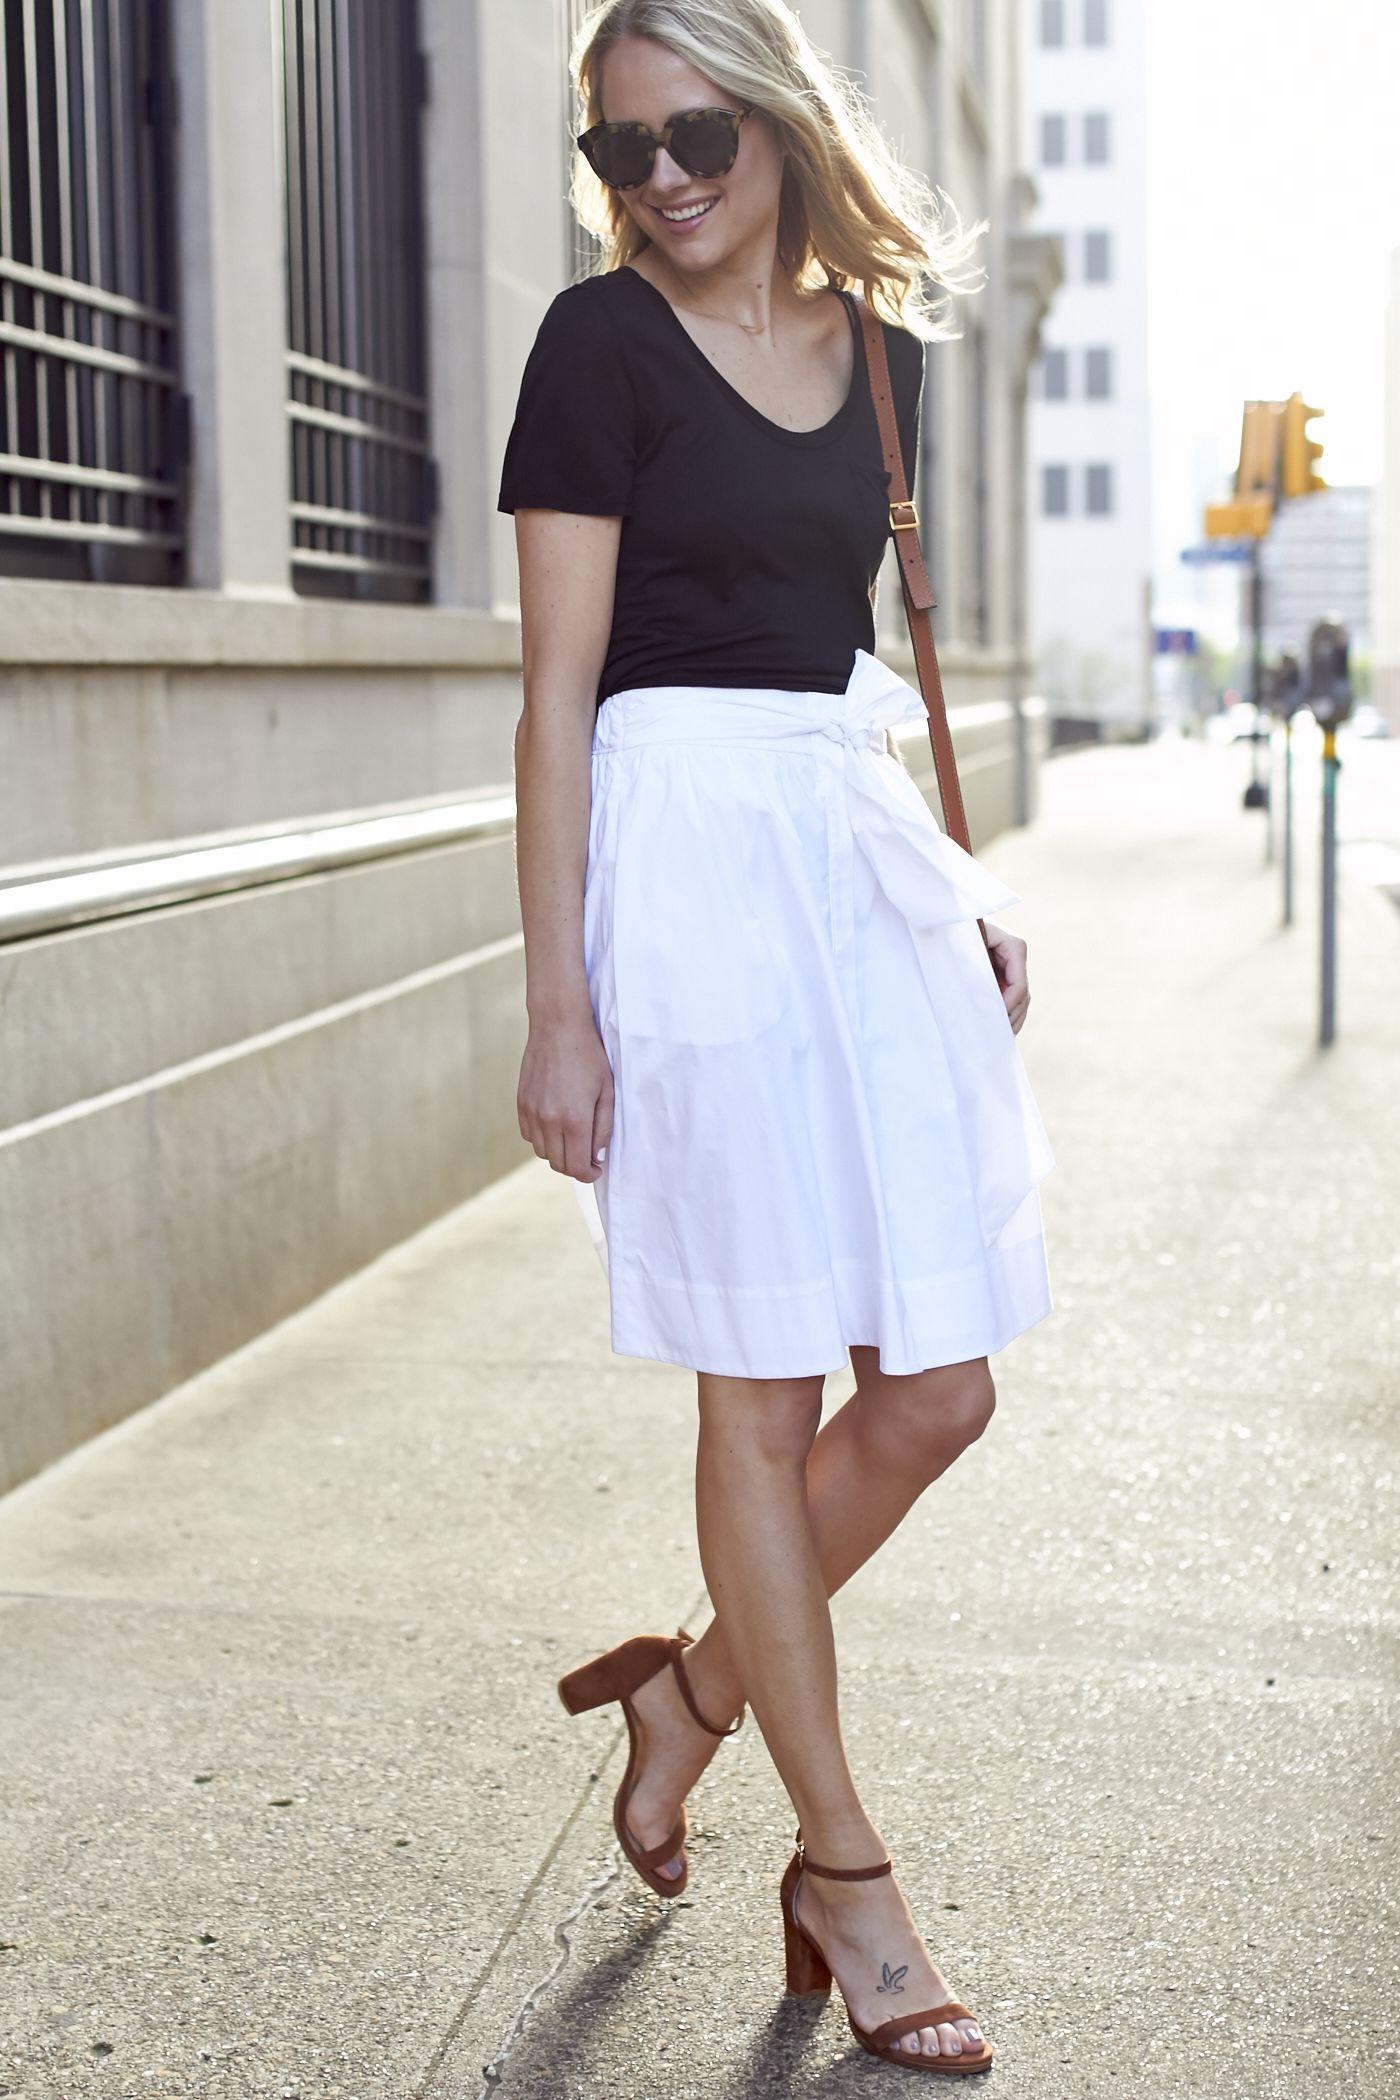 8b83a3e6f18 fashion-jackson-club-monaco-gheraldina-skirt-black-tshirt-stuart-weitzman -nearly-nude-sandals